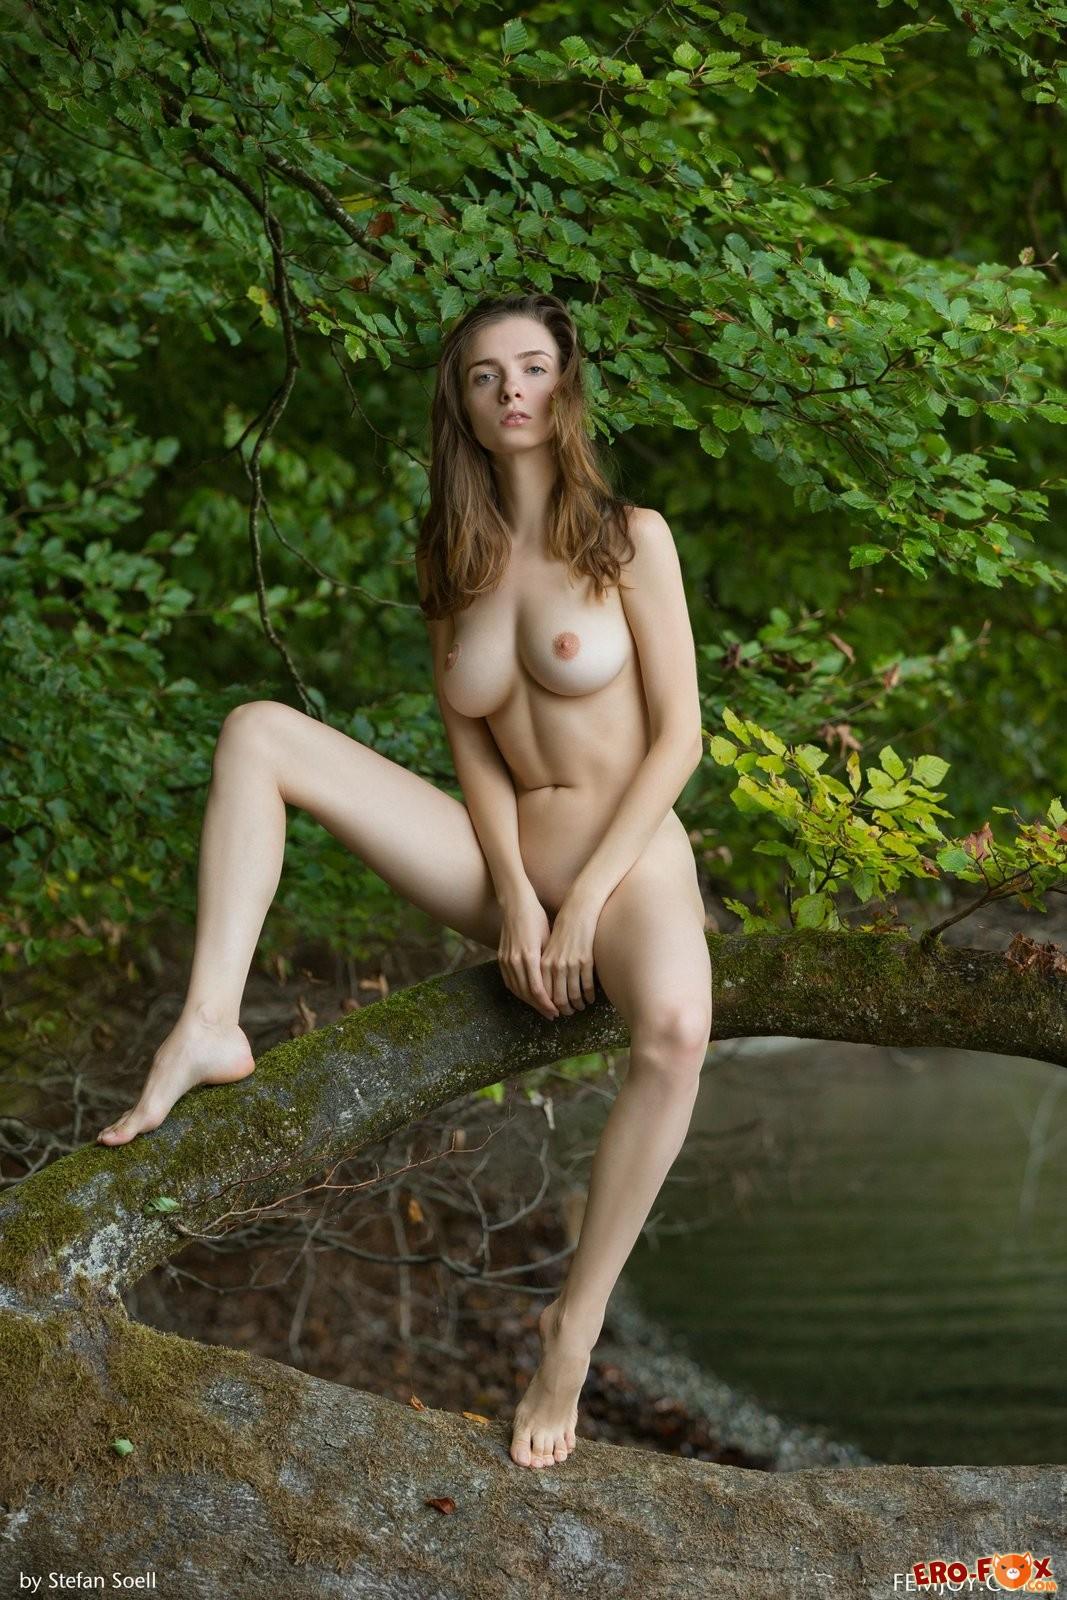 Голая красавица позирует в лесу - ню фото.